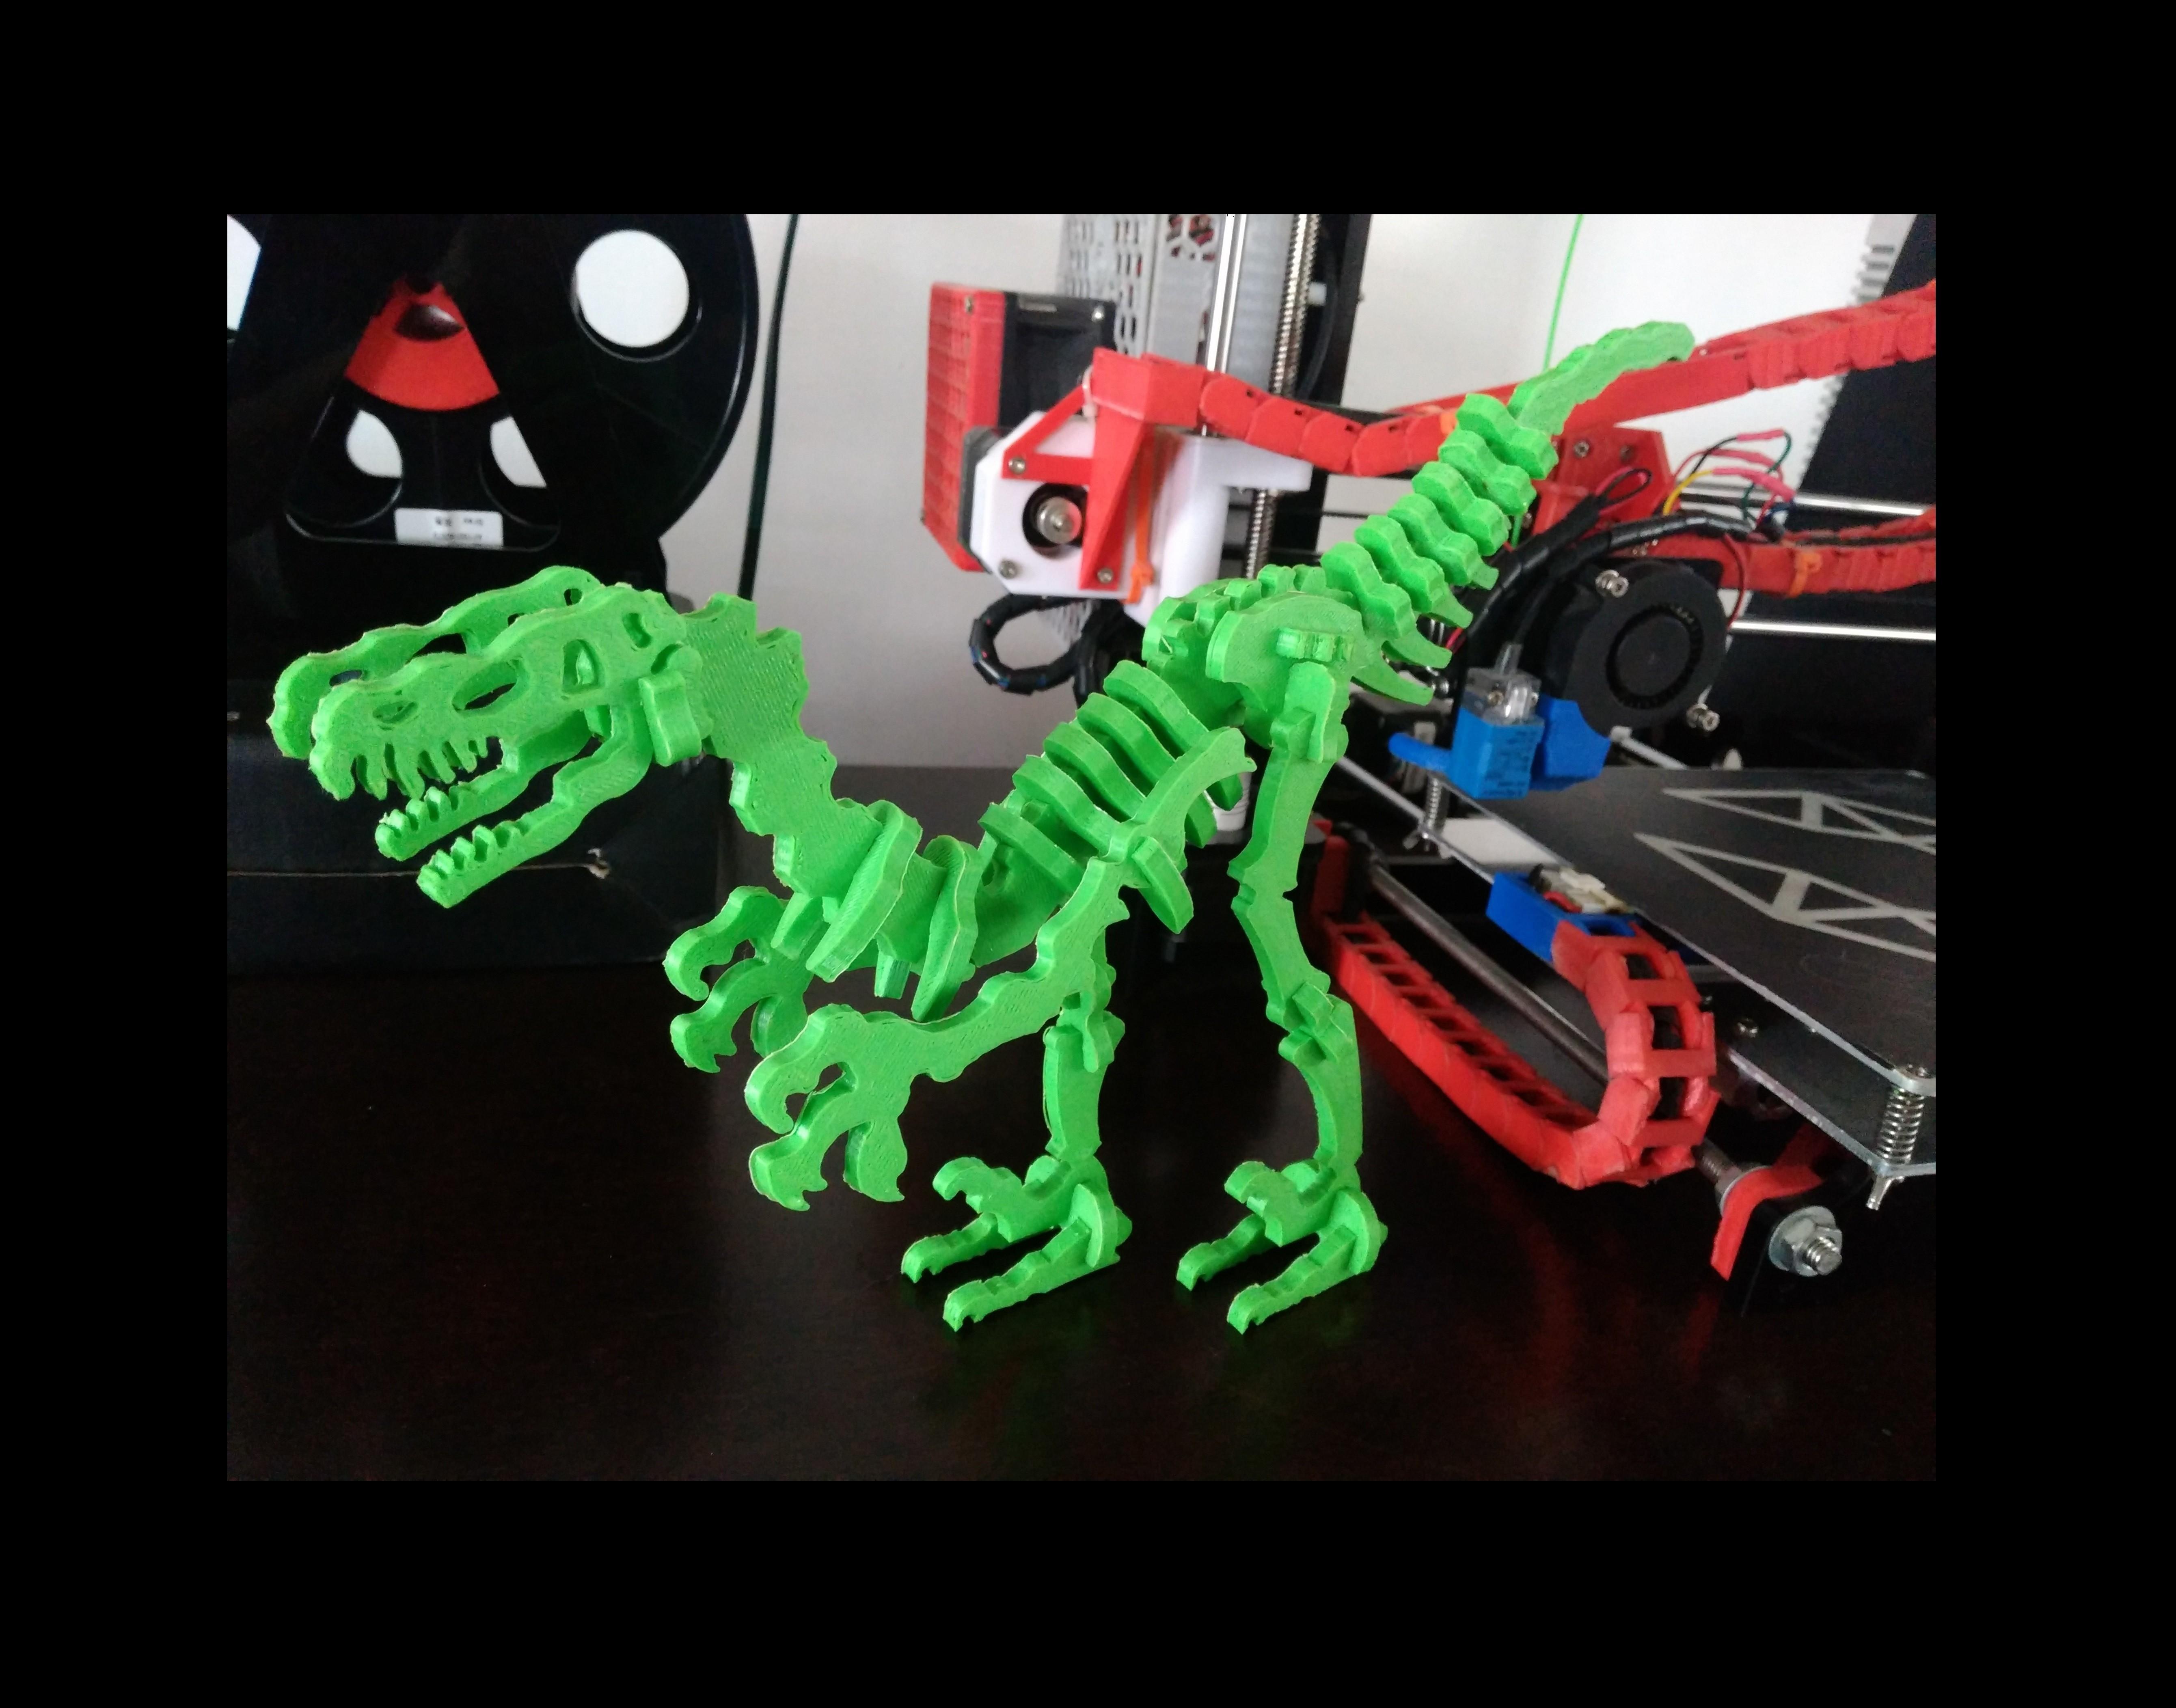 Terry.jpg Download free STL file Dinosaur Skel for 3D Printer! - Terry the Dinosaur! • 3D printer model, _aalejandrovr24